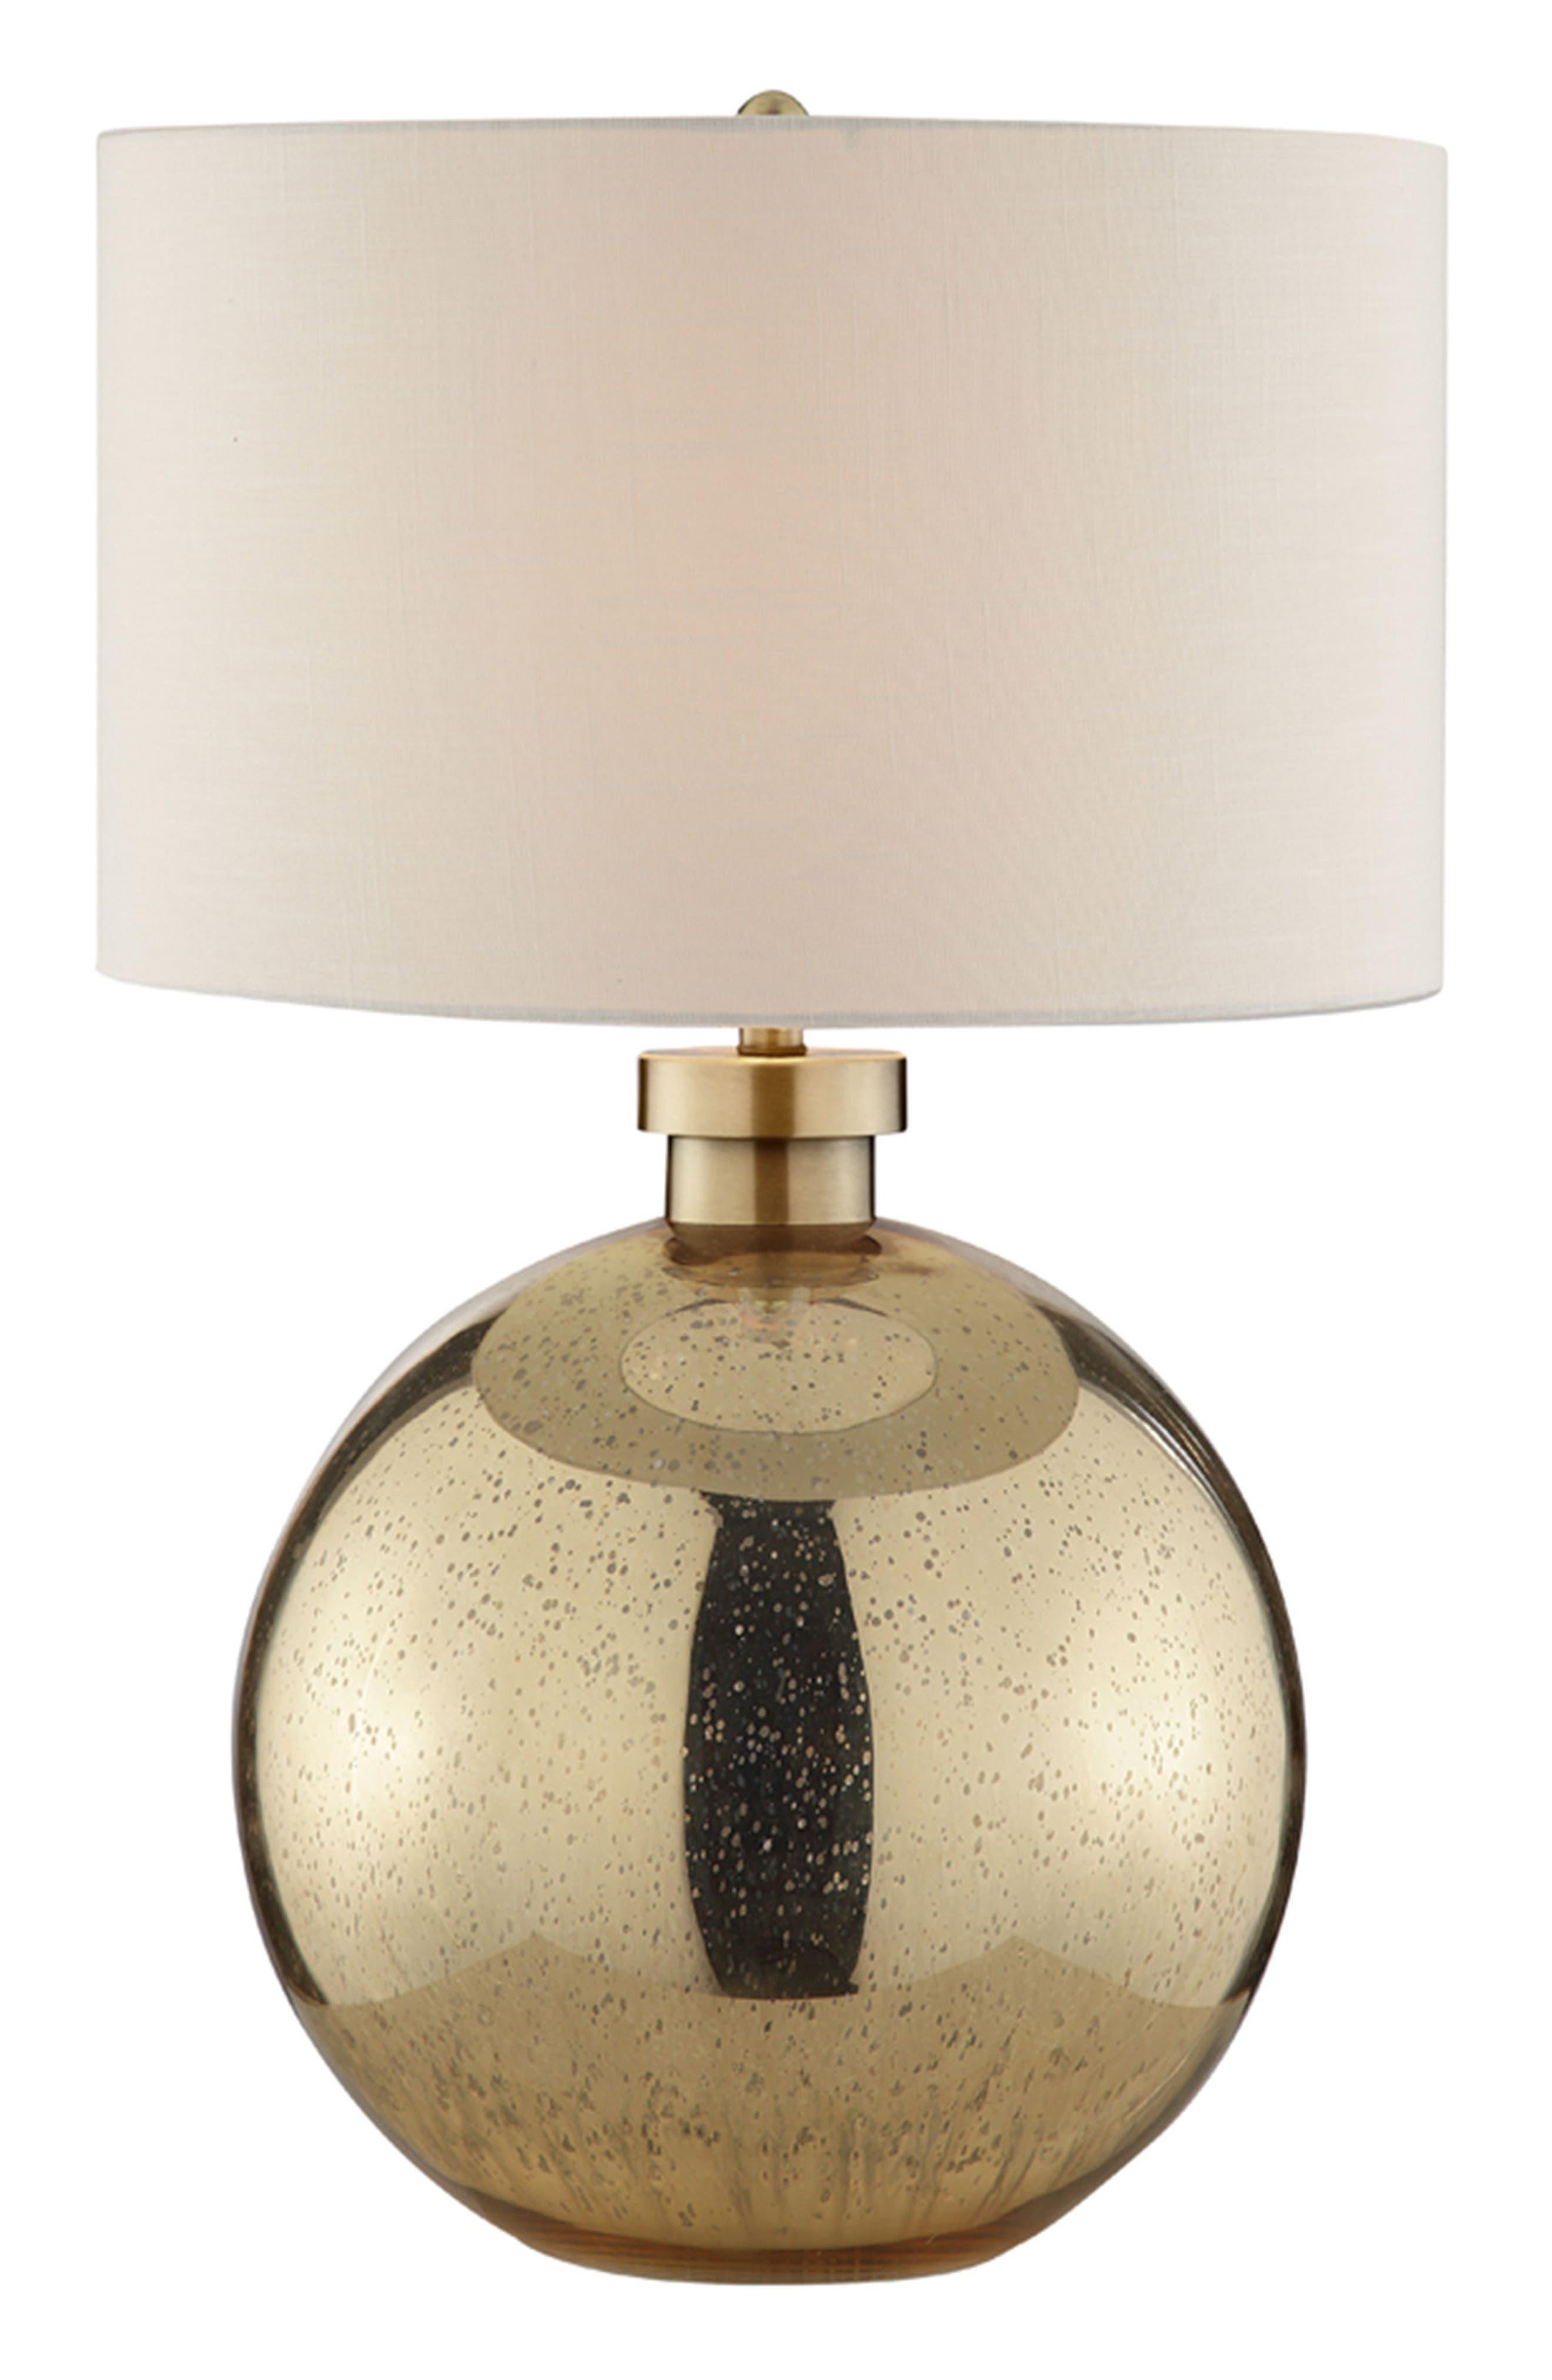 JAlexander Luna Gold Table Lamp,                             Main thumbnail 1, color,                             710